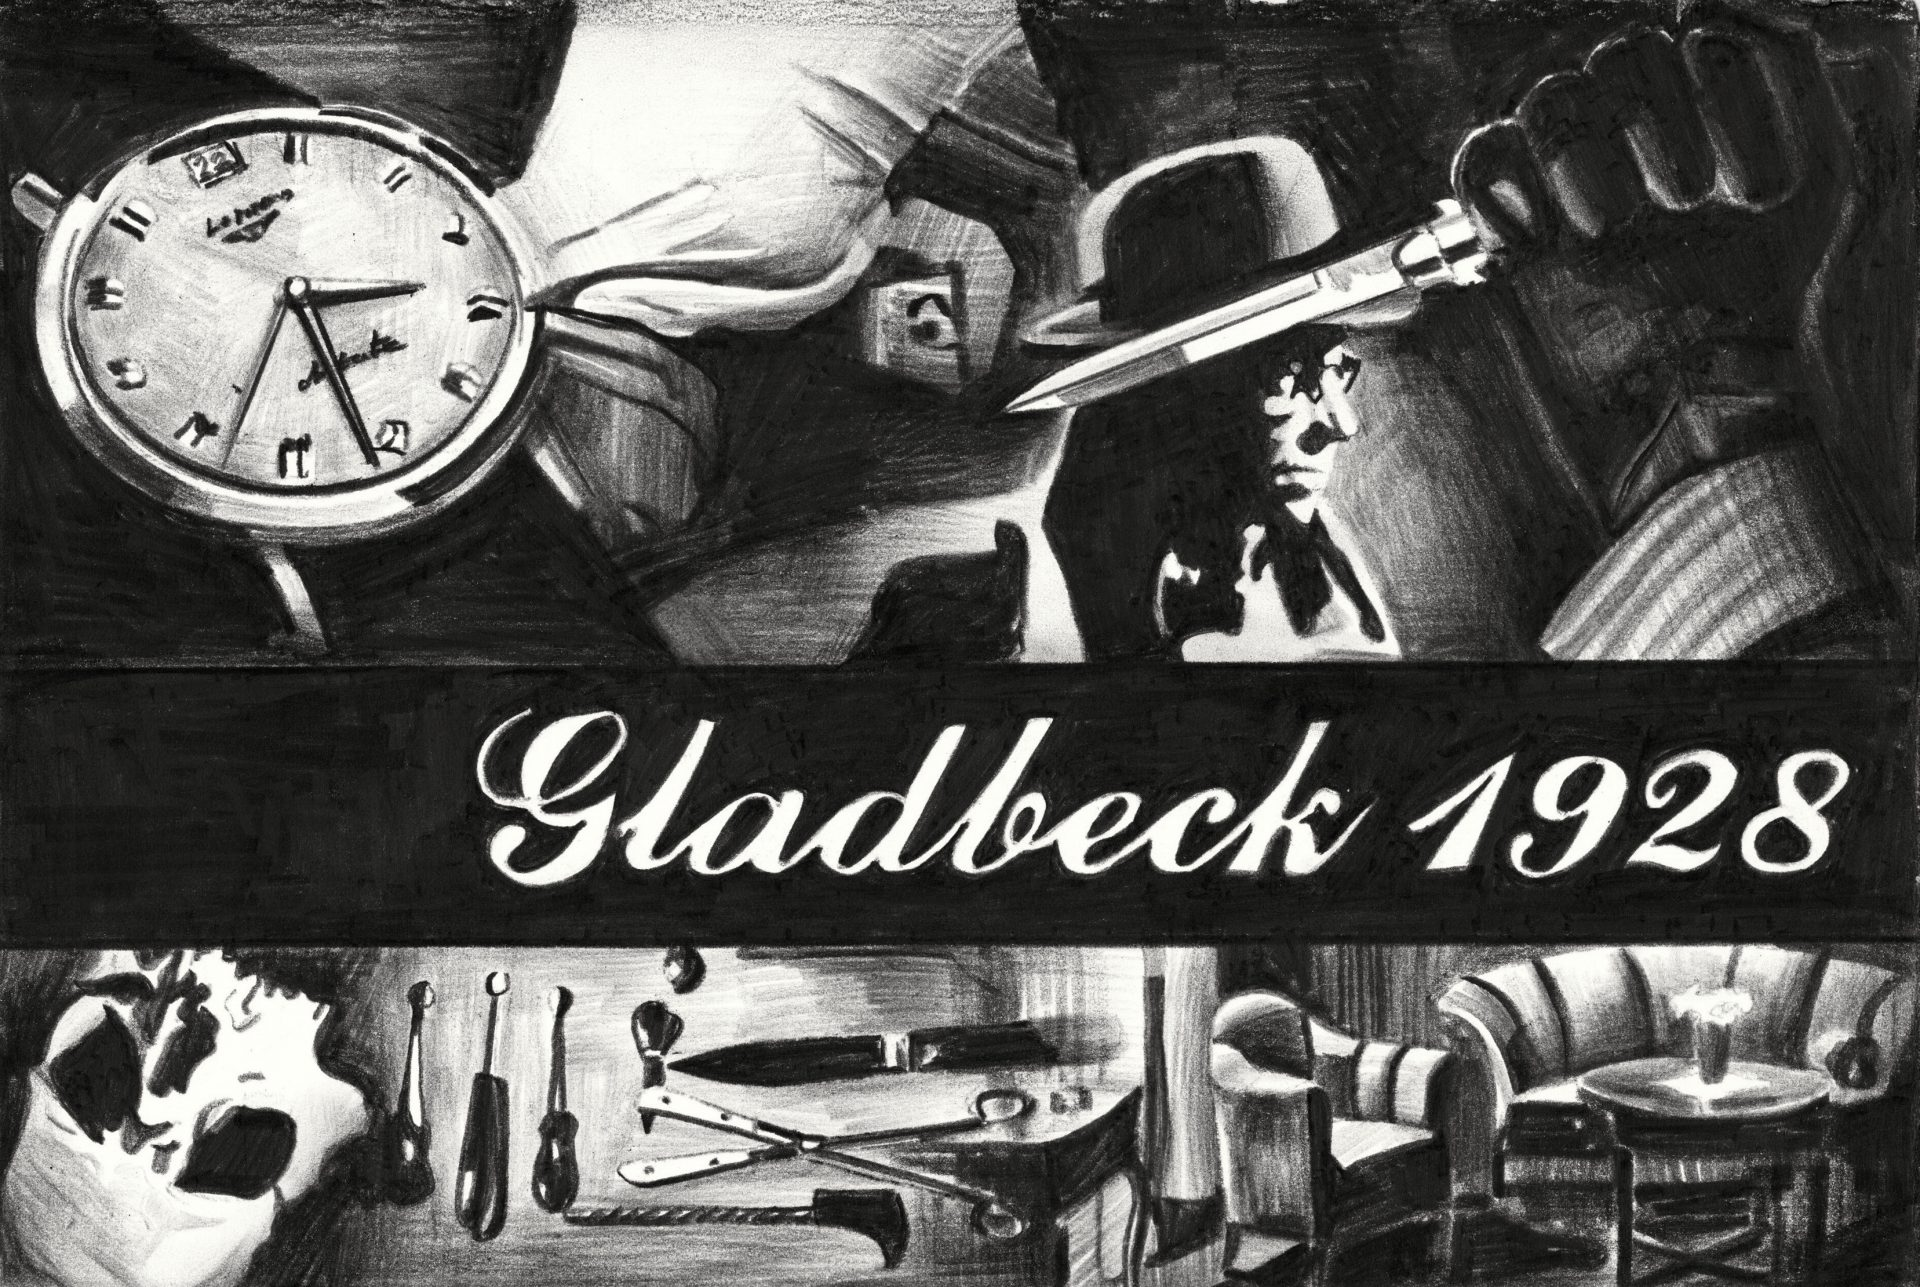 Marcel-van-Eeden-Gladbeck-1928-Nerostift-auf-Papier-2013